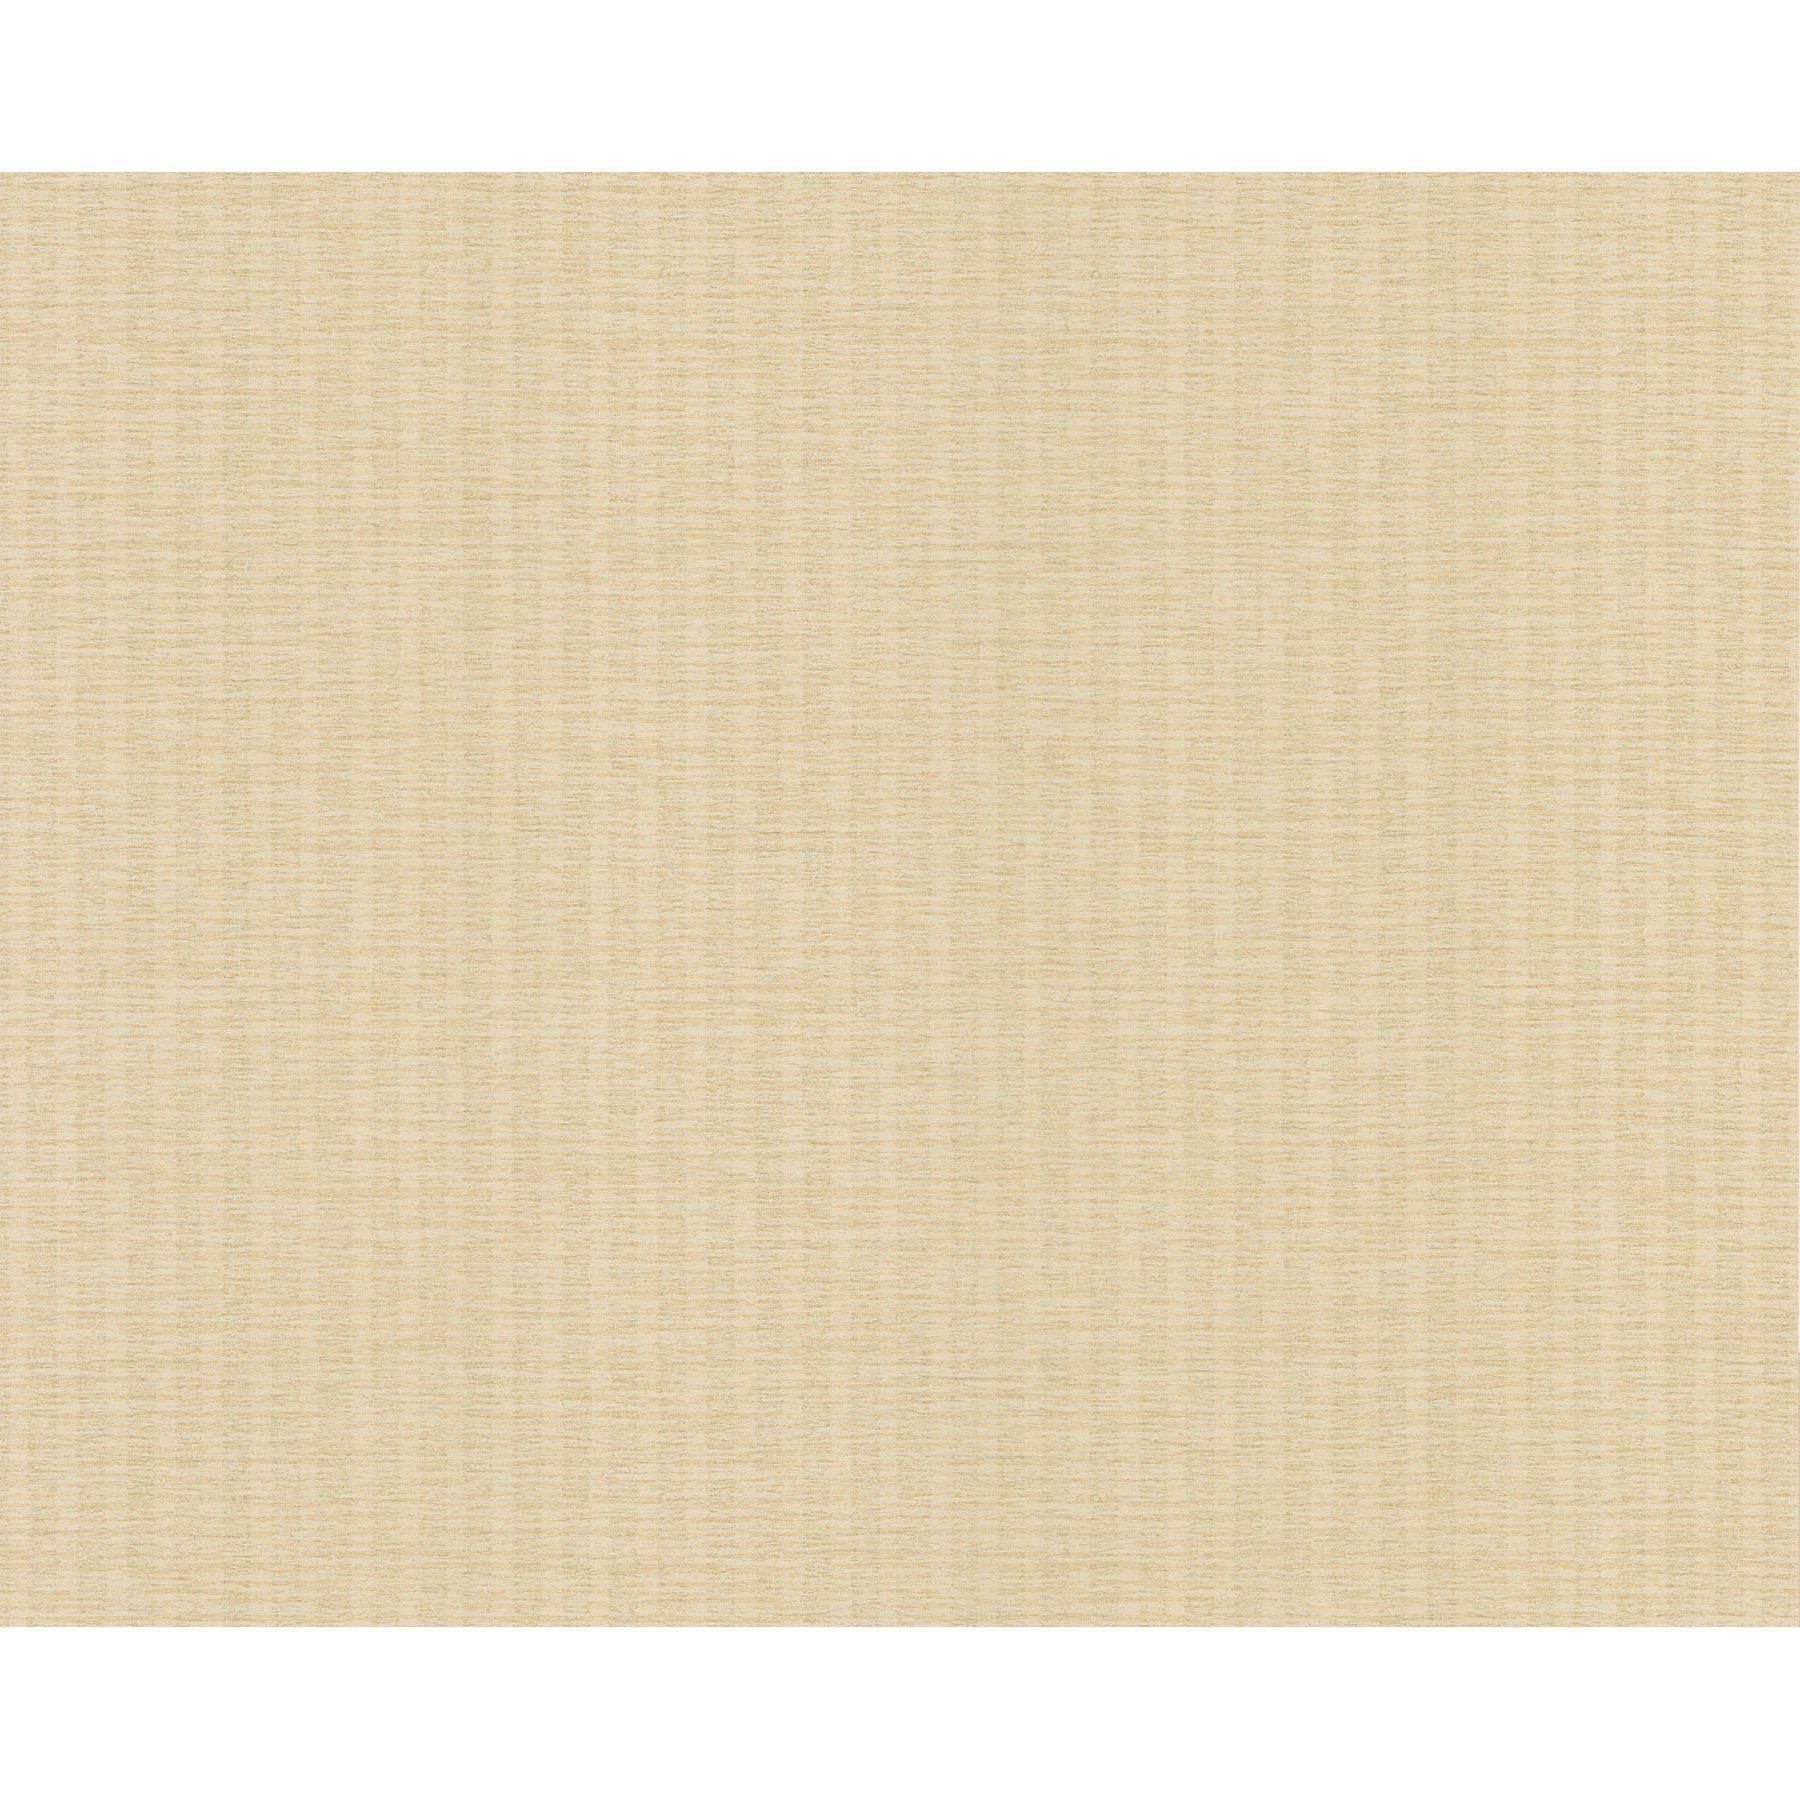 Brewster Home Fashions Beige Texture Wallpaper (Beige Texture Wallpaper), Brown